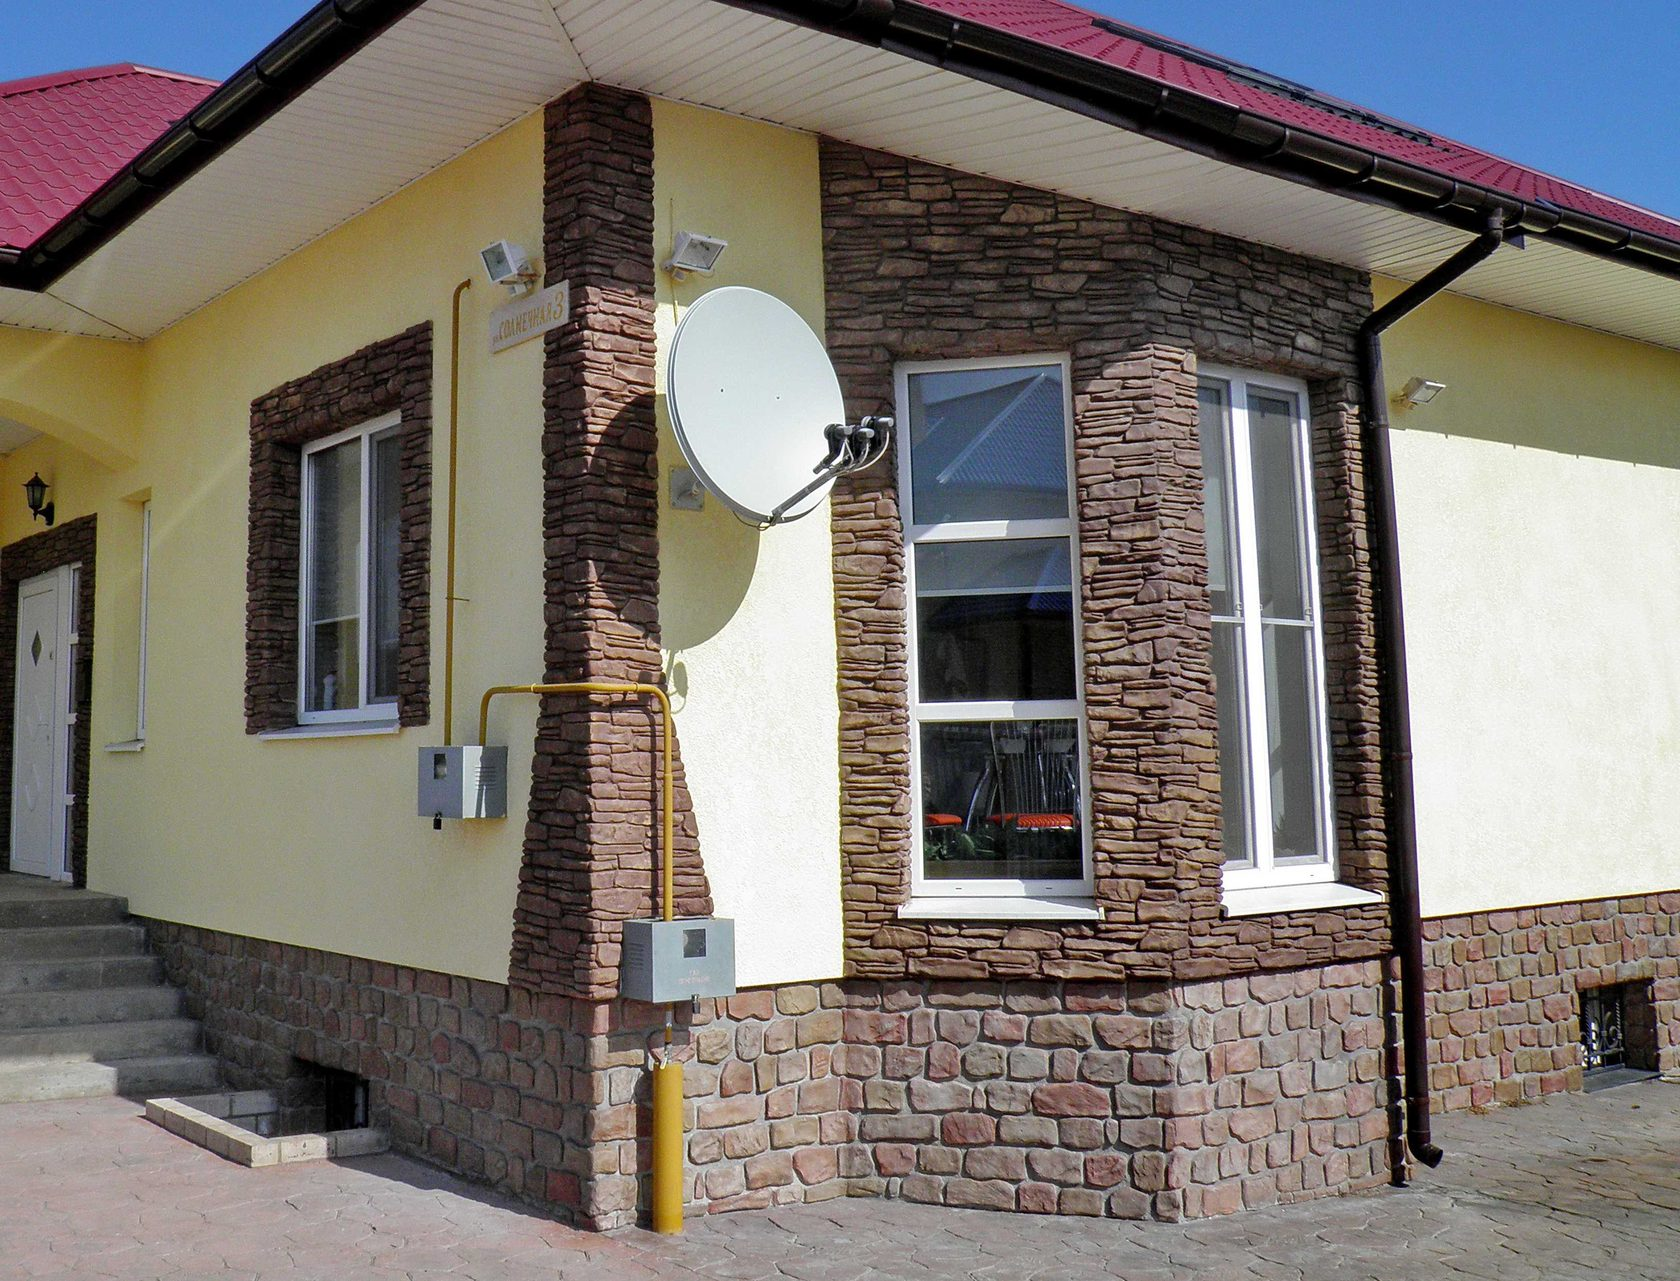 фасад дома штукатурка с декоративным камнем фото том, что кирилл